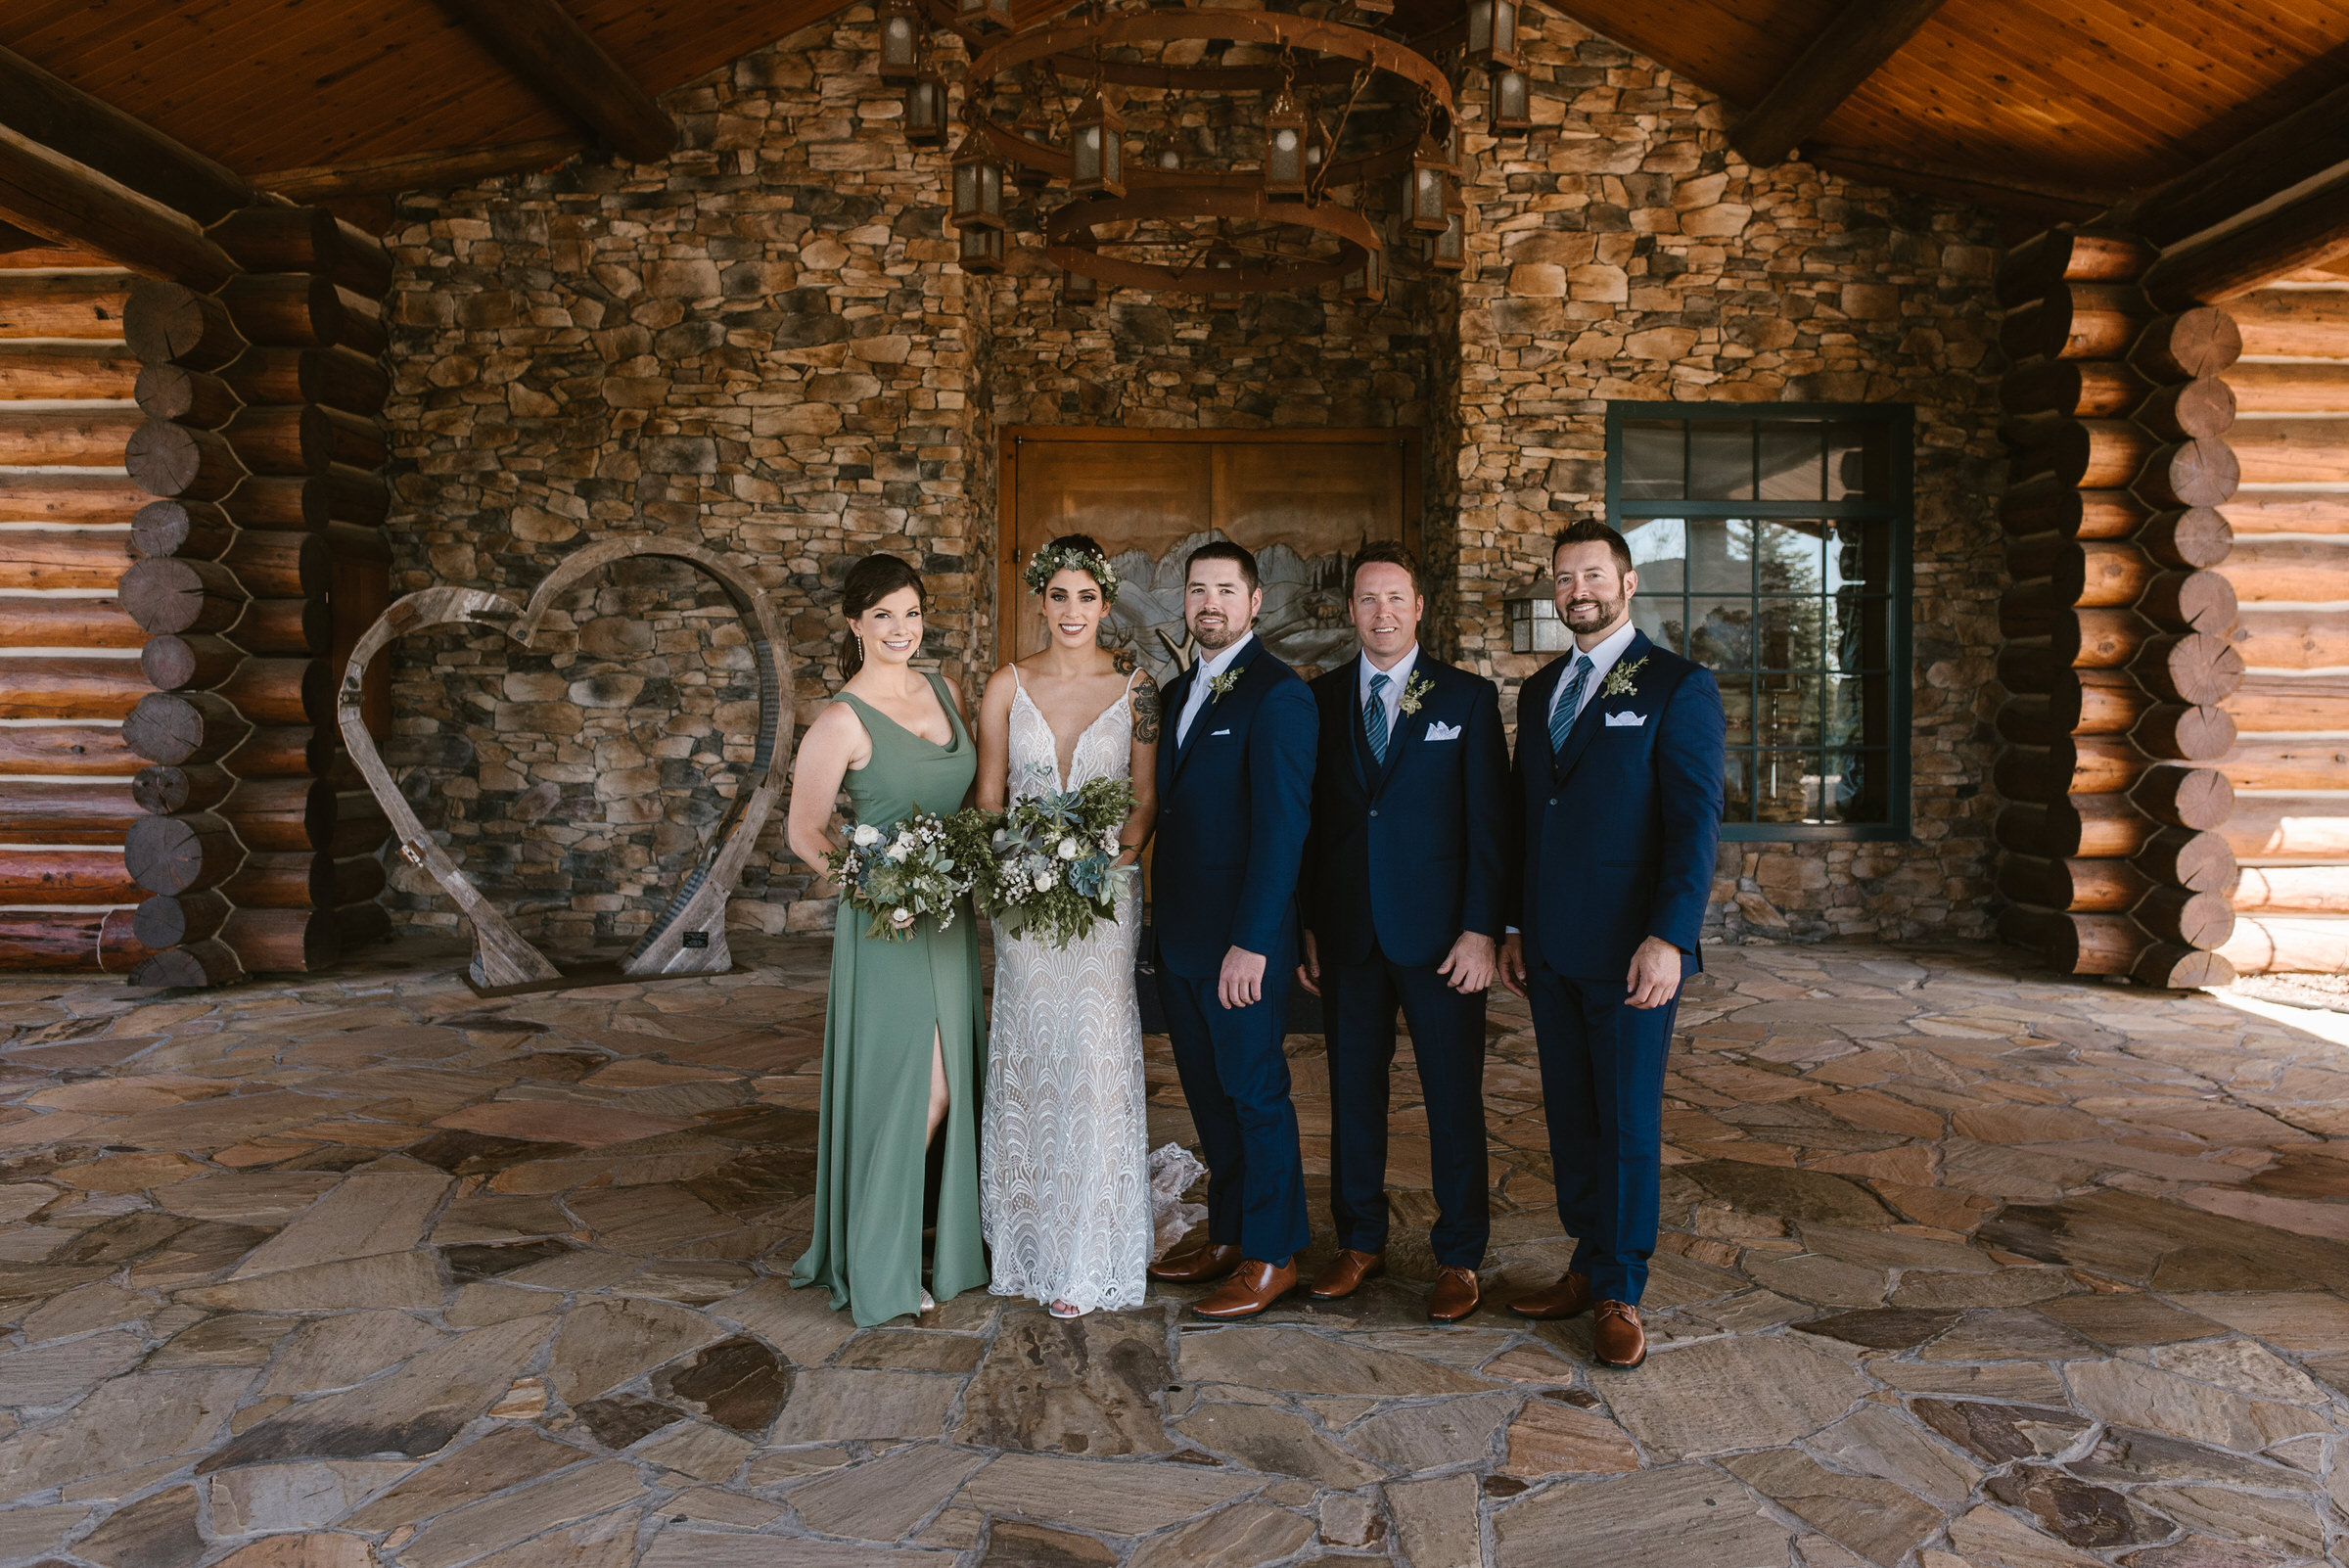 Wilderness-Ridge-Lincoln-Nebraska-Wedding-Kaylie-Sirek-Photography-039.jpg